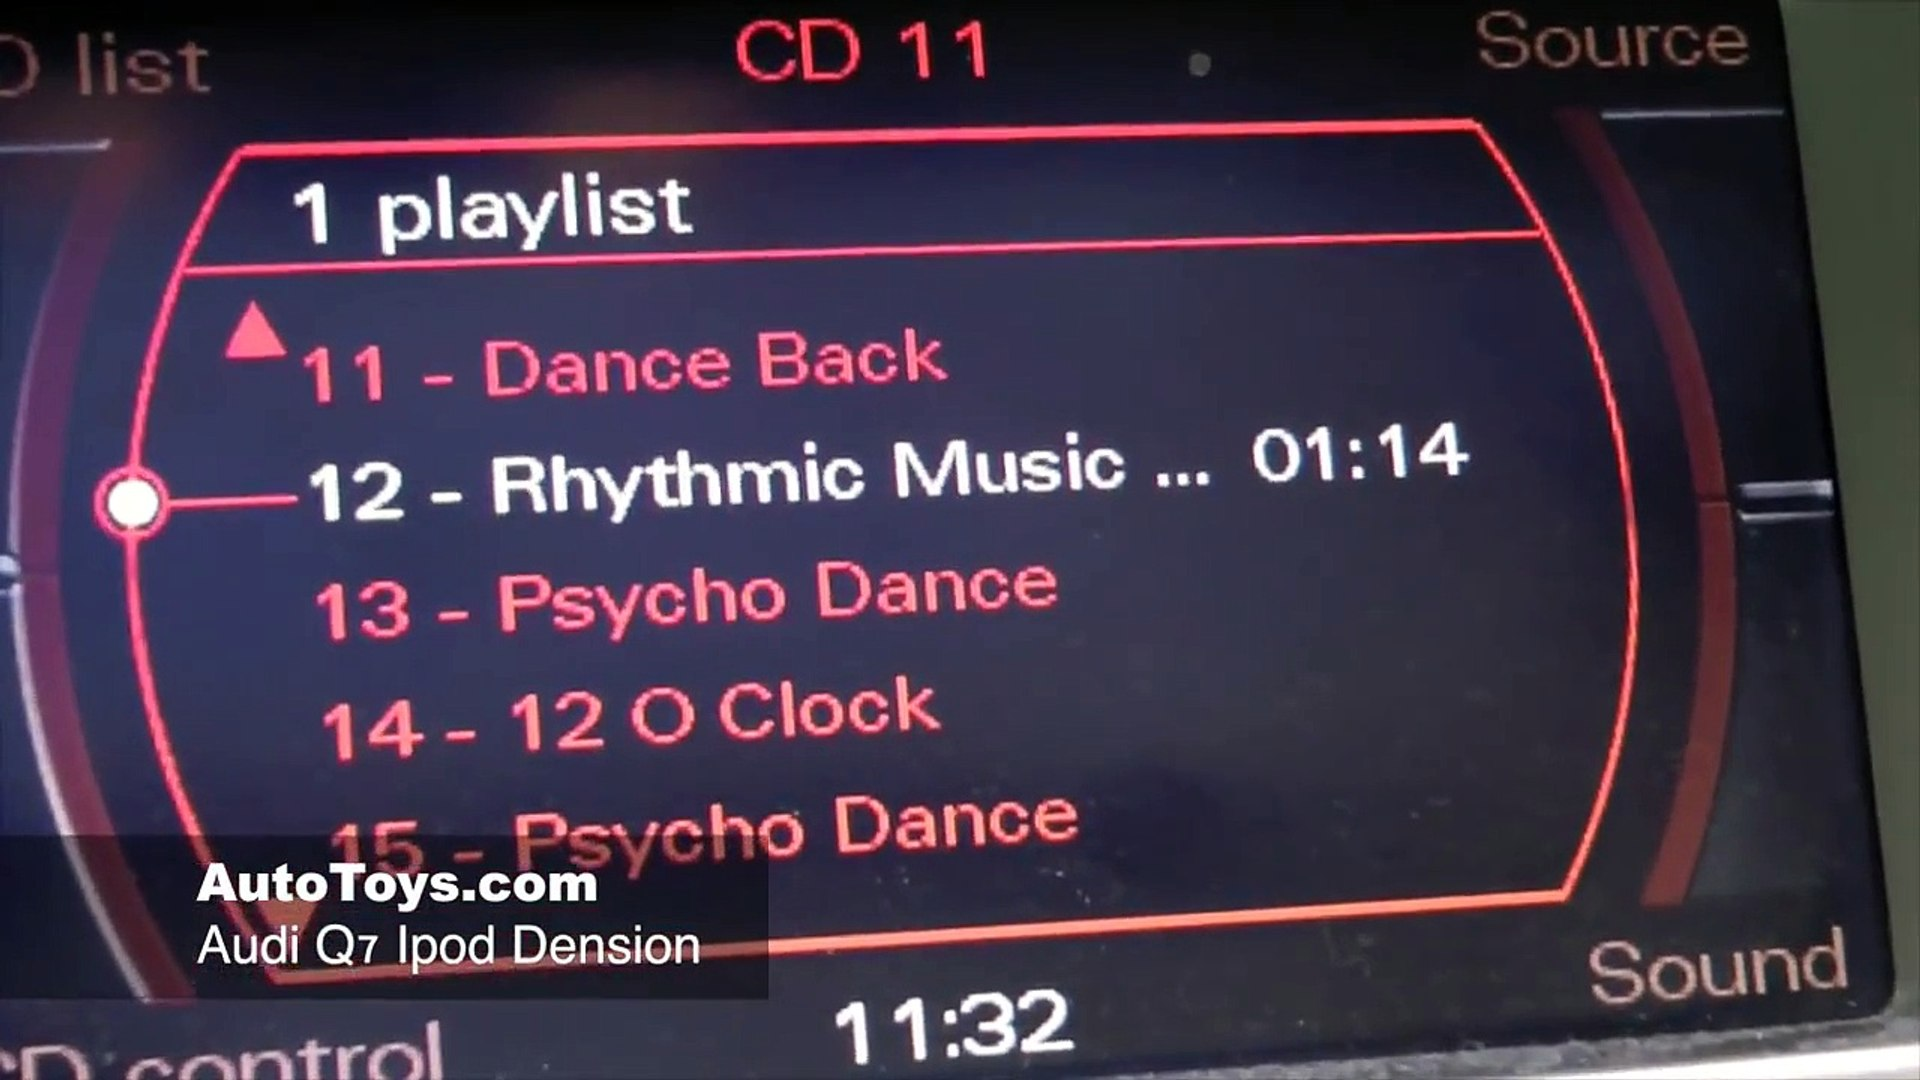 Audi Q7 IPOD USB Aux, Dension GW51Mo2 Installation MOST ( GW52MO2 ) by  Autotoys com